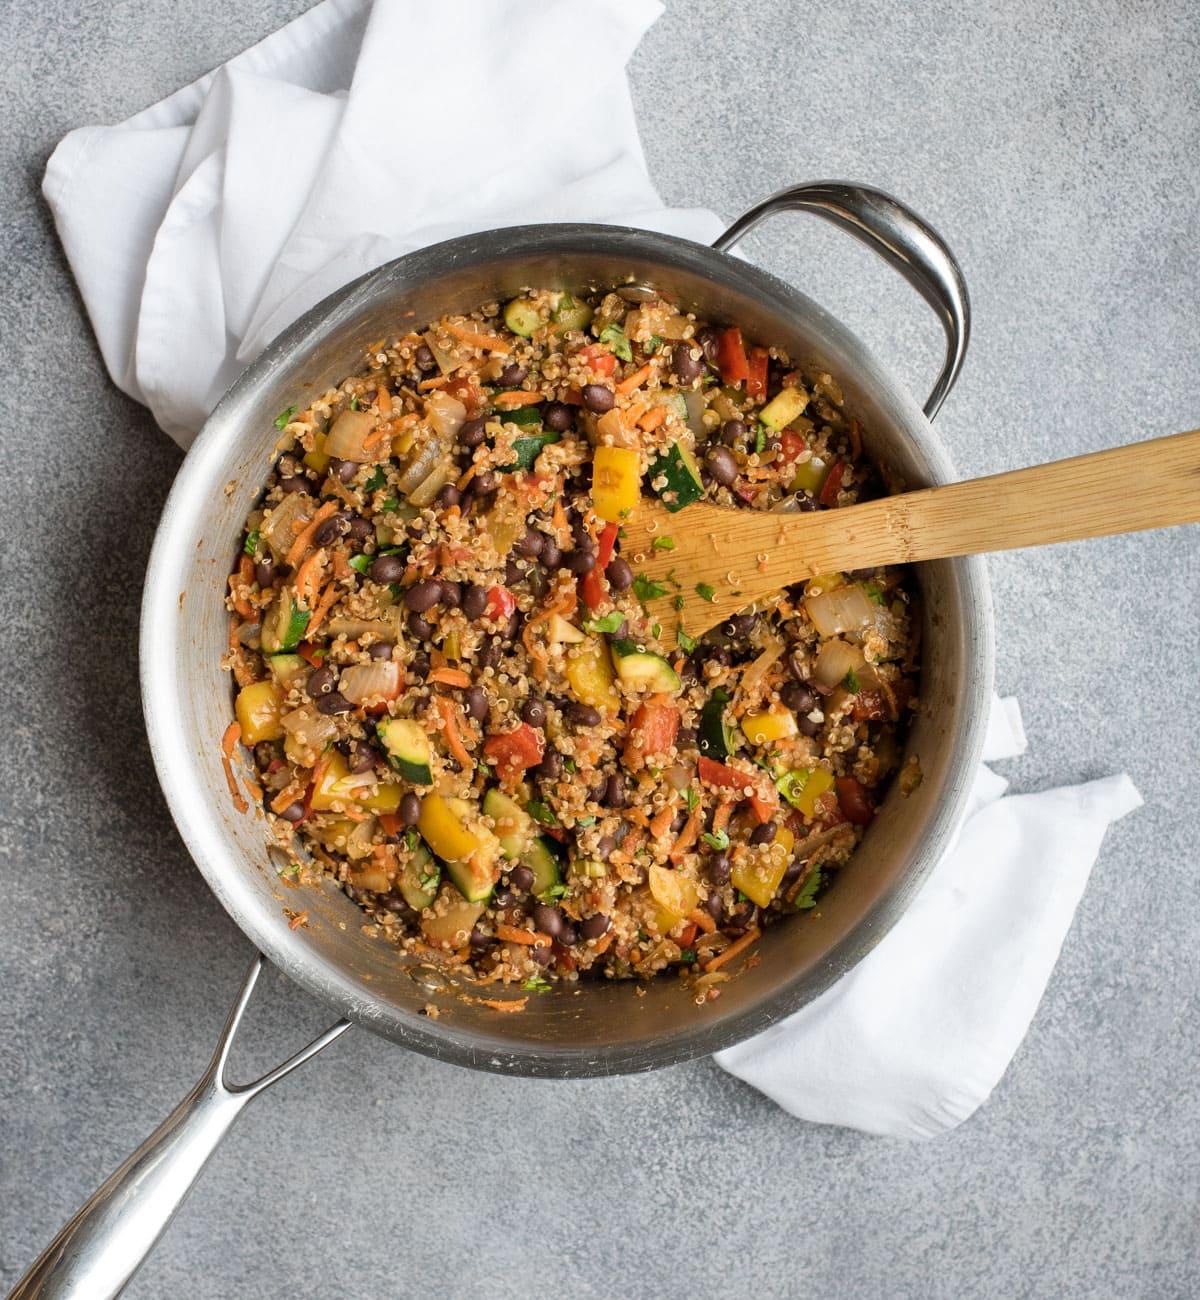 Black bean quinoa casserole process picture of quinoa and vegetables in a saute pan